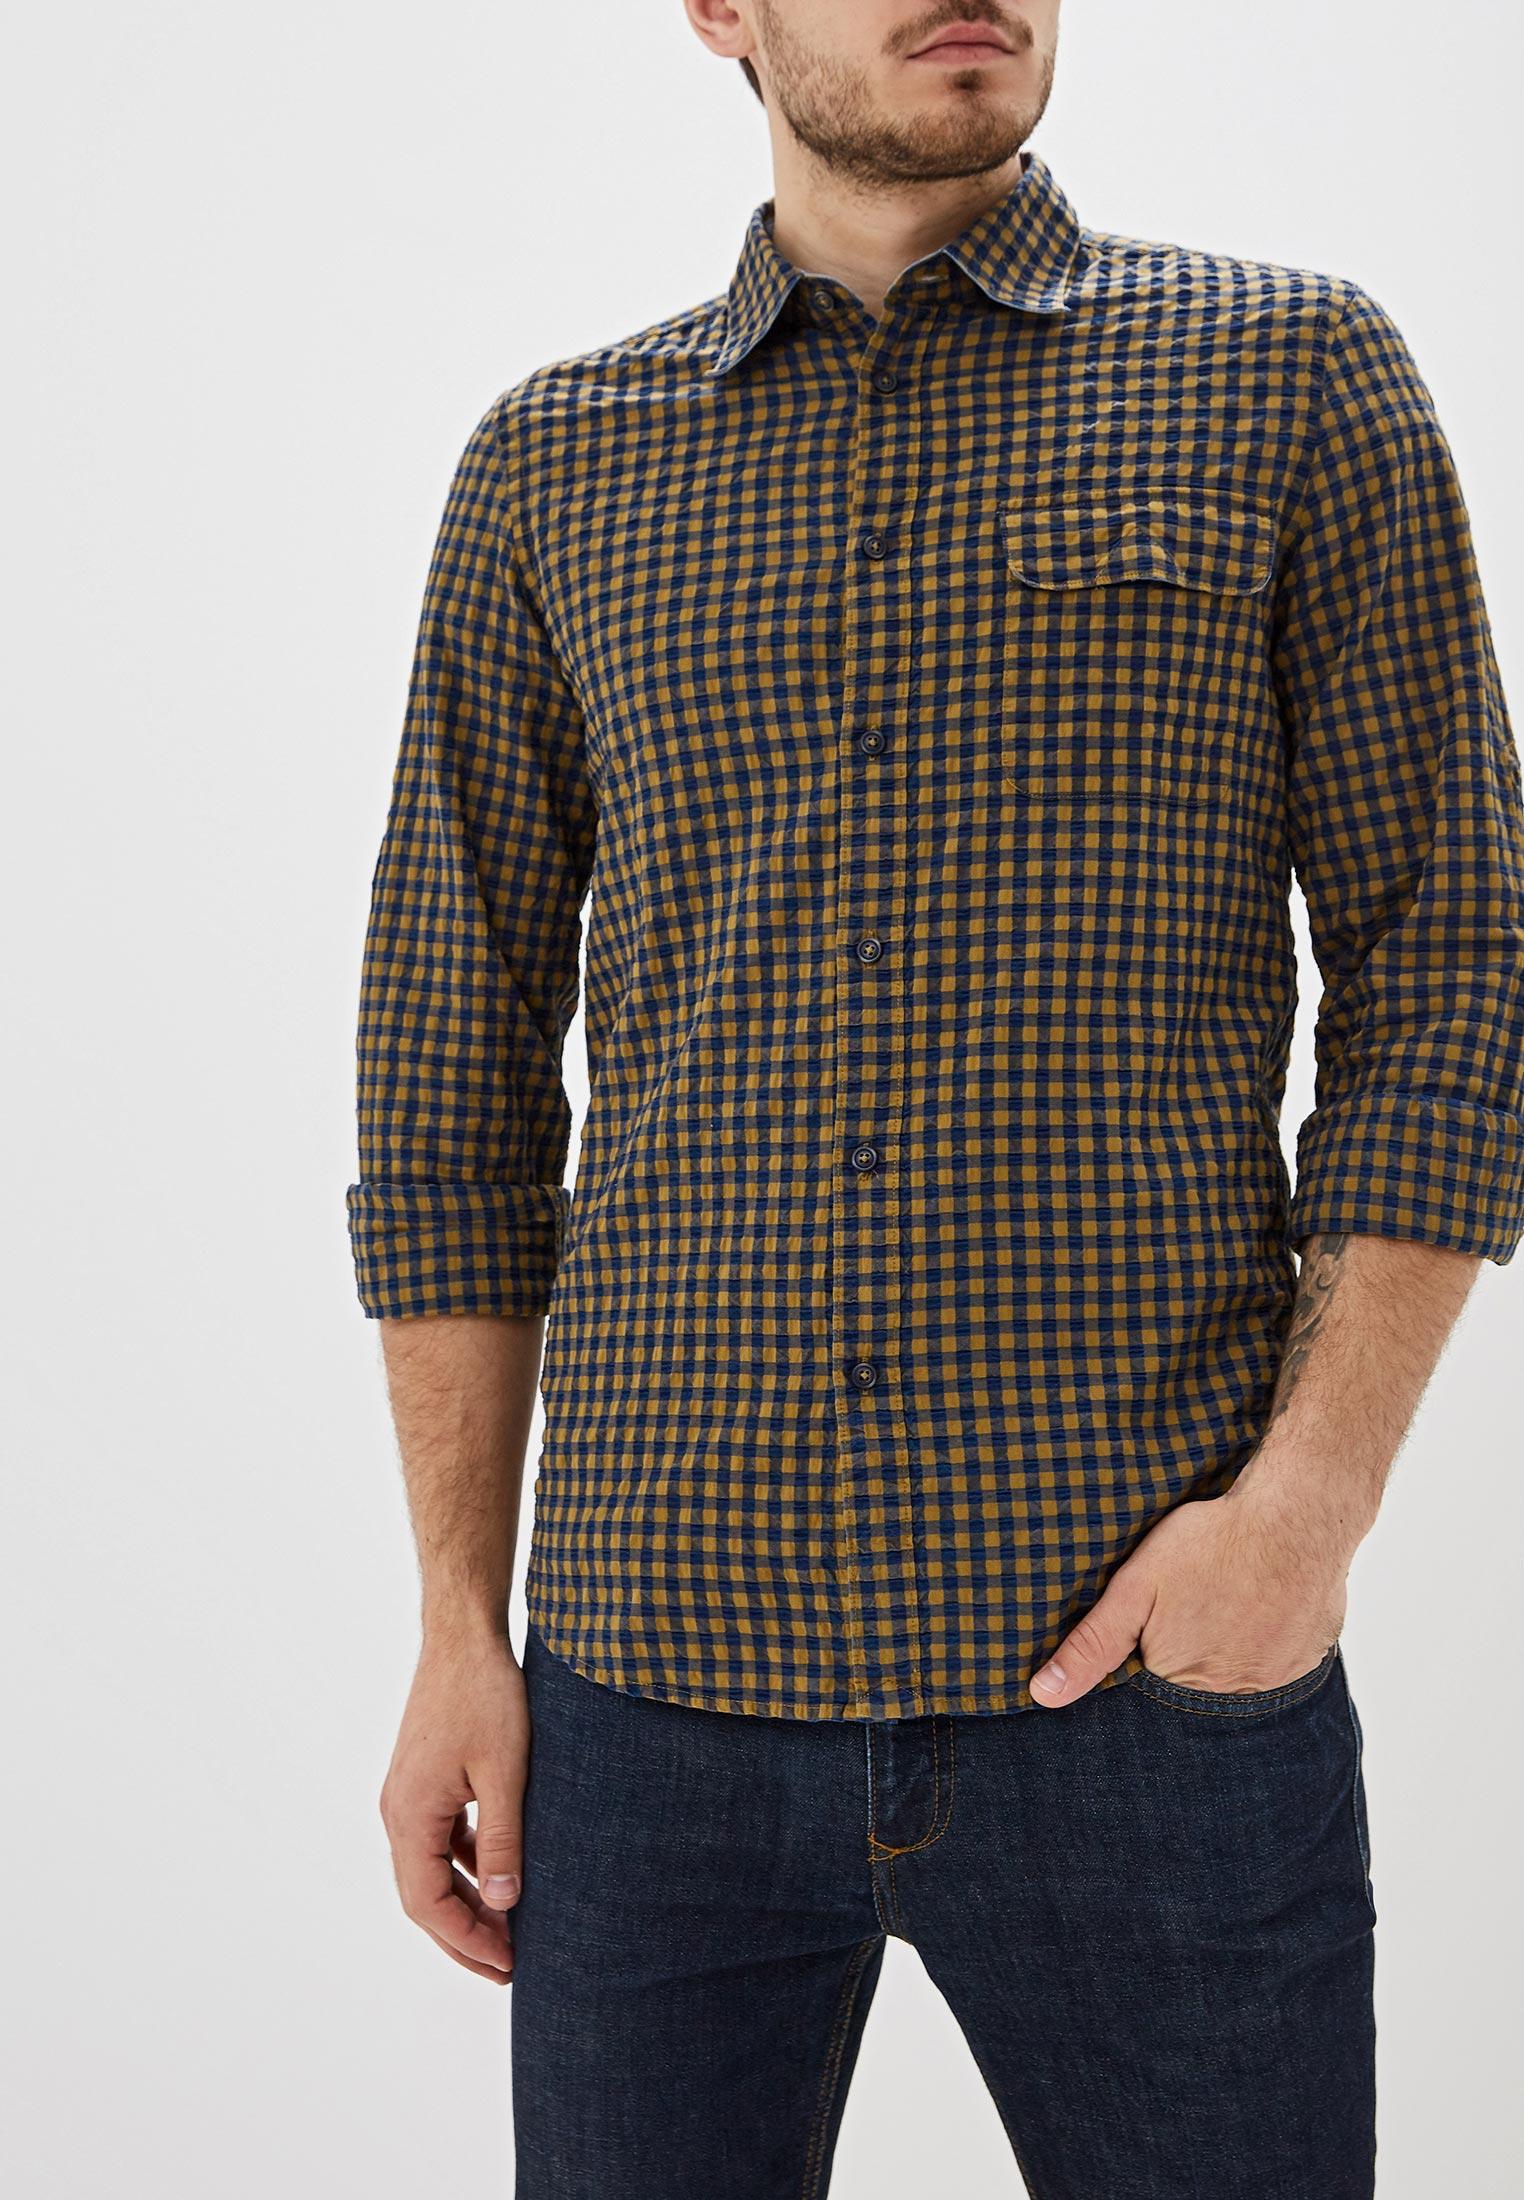 Рубашка с длинным рукавом United Colors of Benetton (Юнайтед Колорс оф Бенеттон) 5JK55QI78